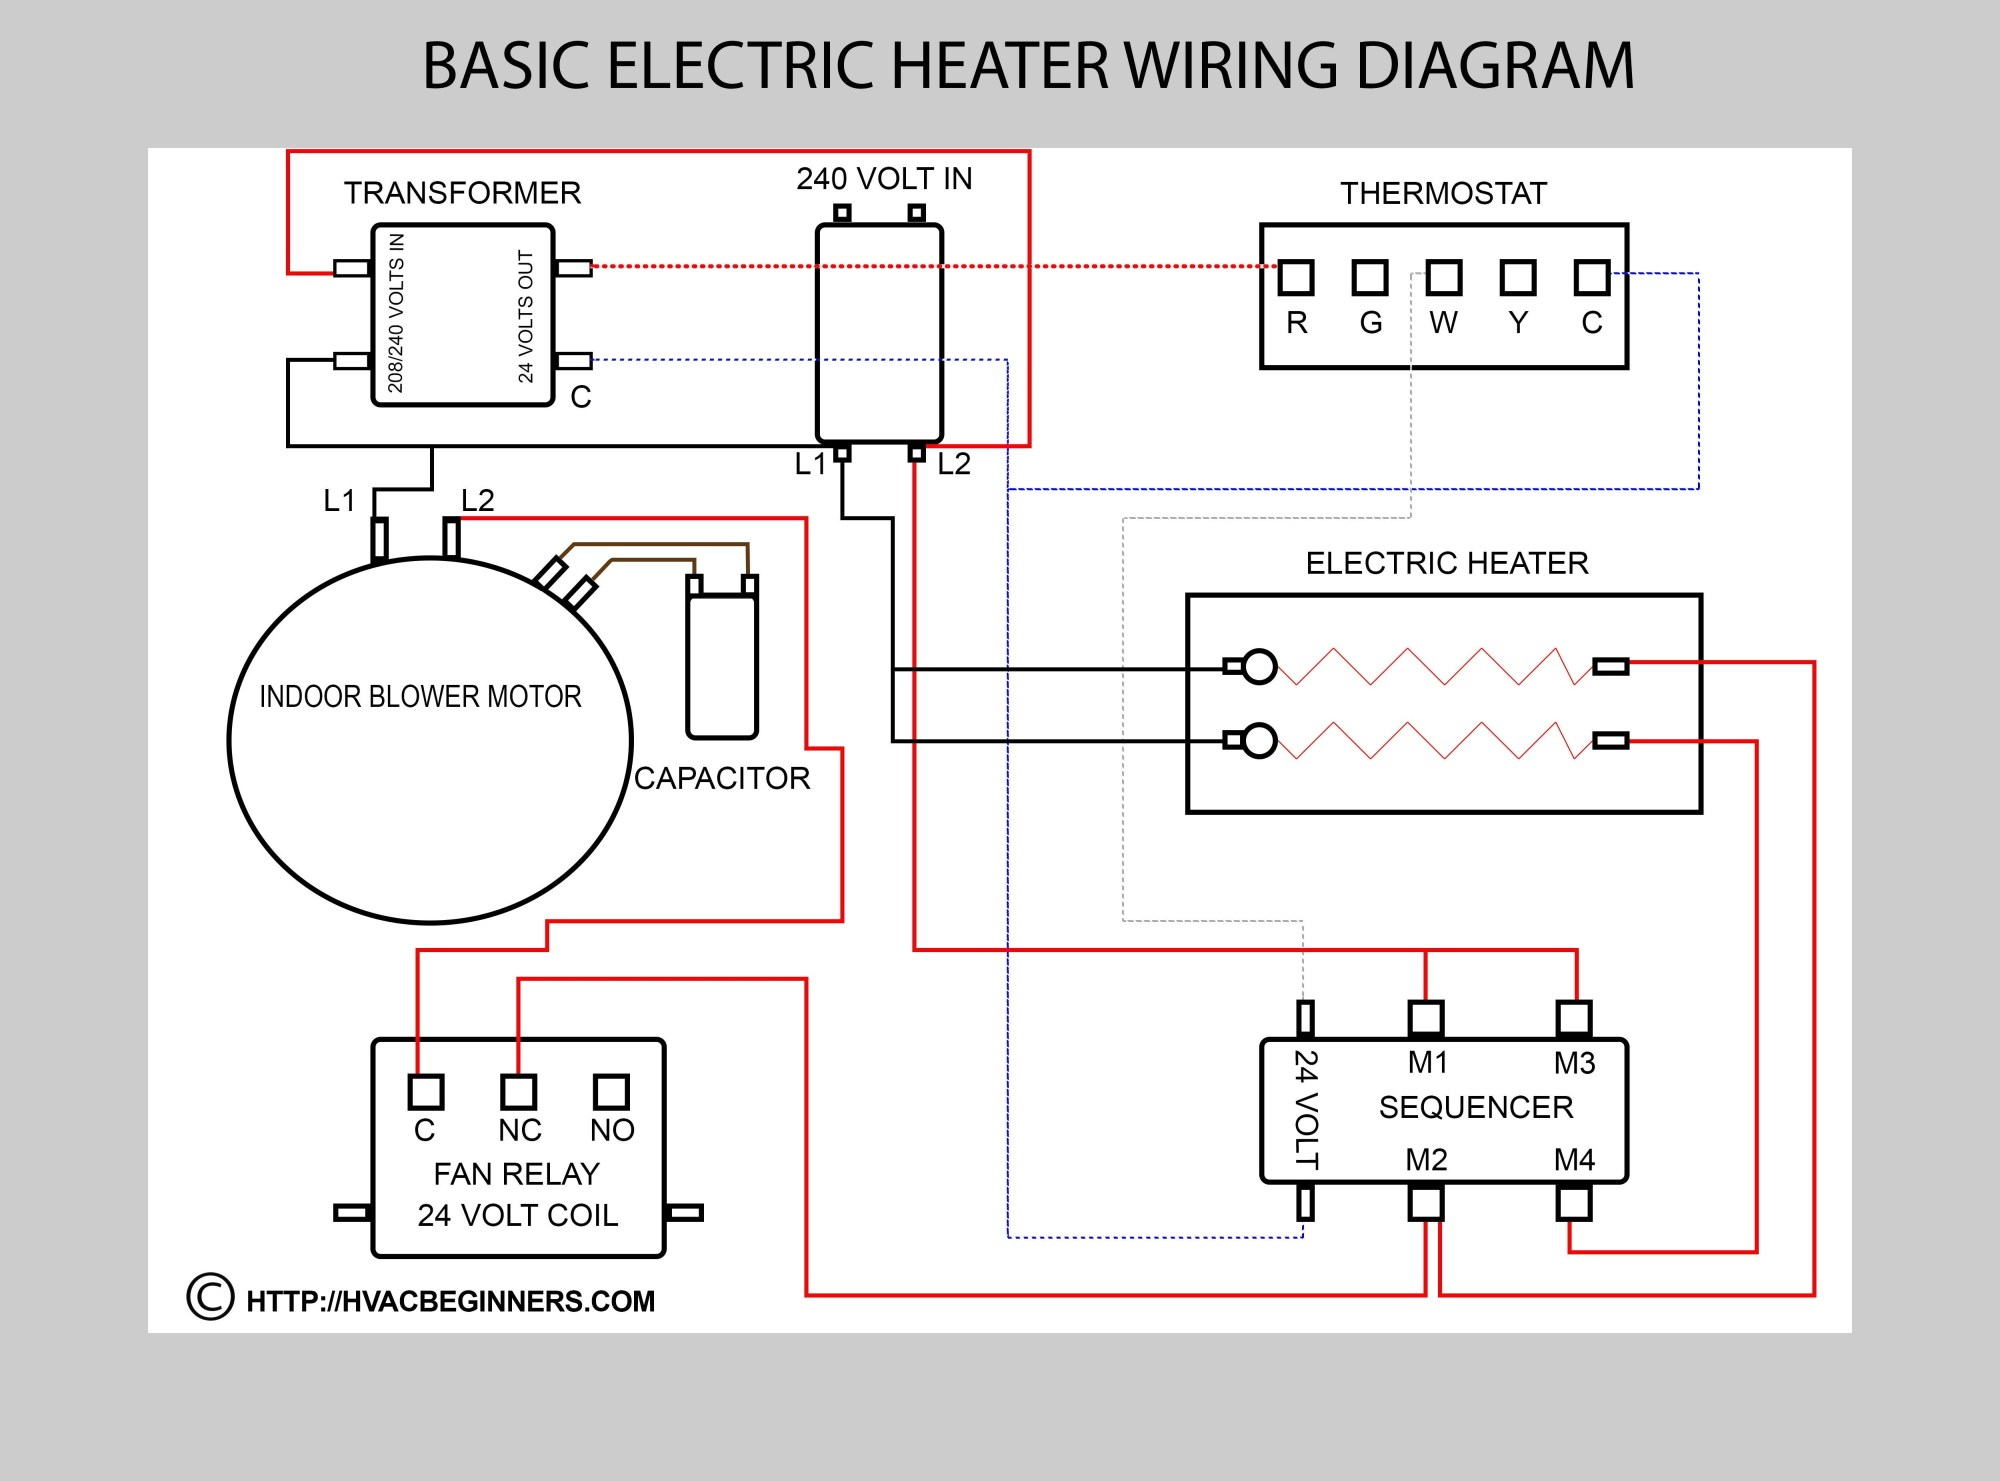 hight resolution of mr slim wiring diagram puh36 42ek wiring diagram blog mr slim thermostat wiring diagram